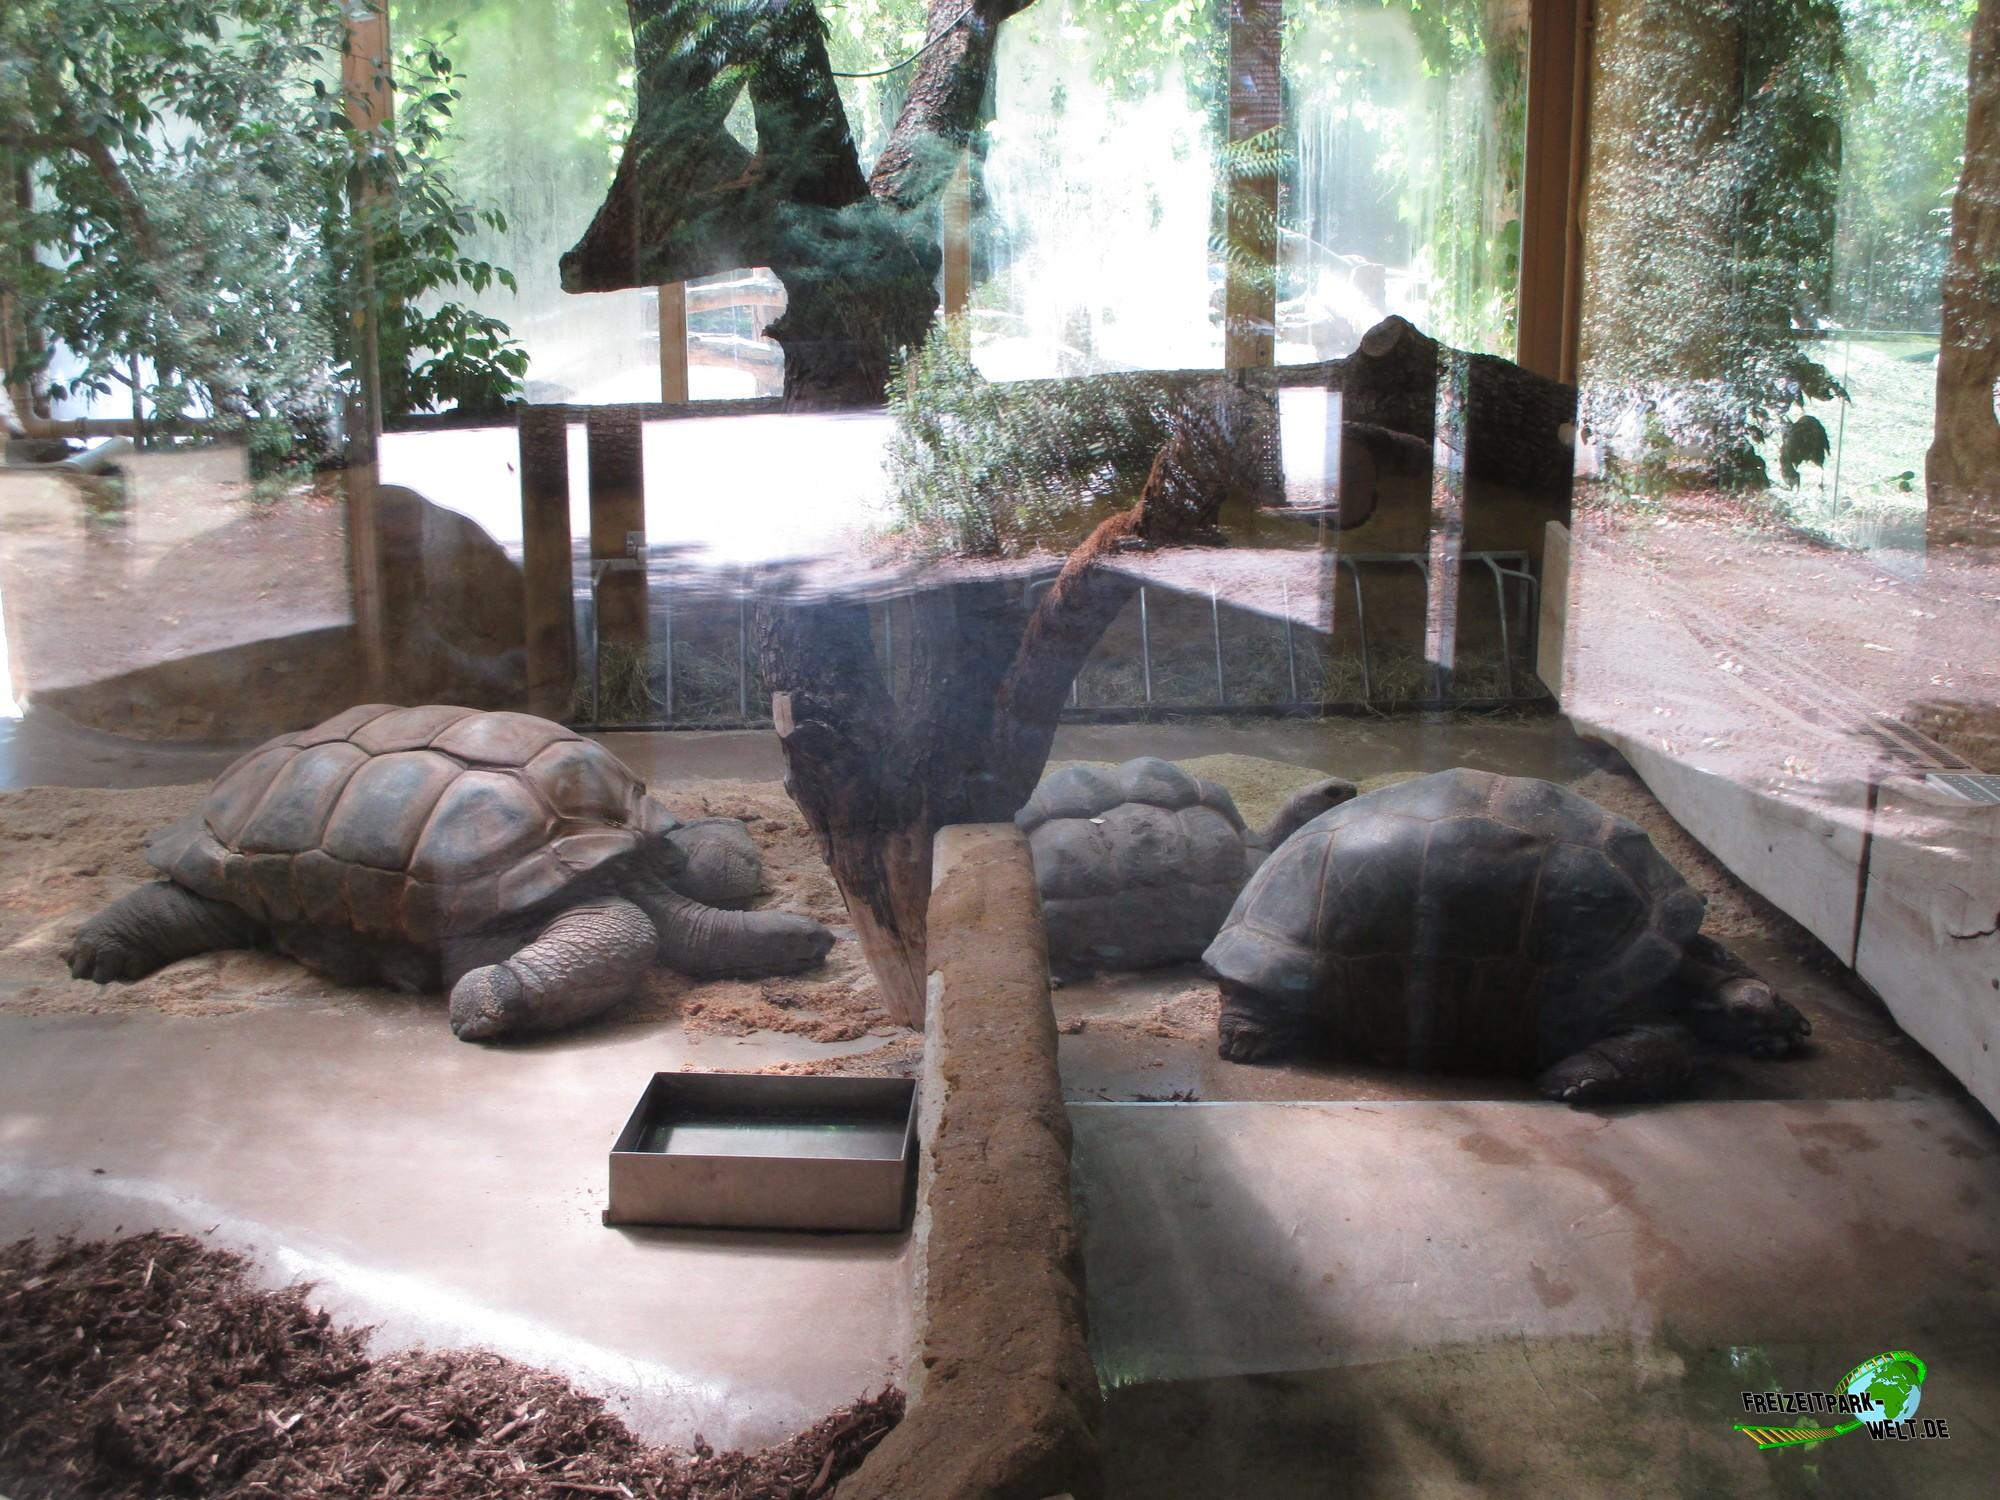 seychellen riesenschildkr te zoo krefeld freizeitpark. Black Bedroom Furniture Sets. Home Design Ideas